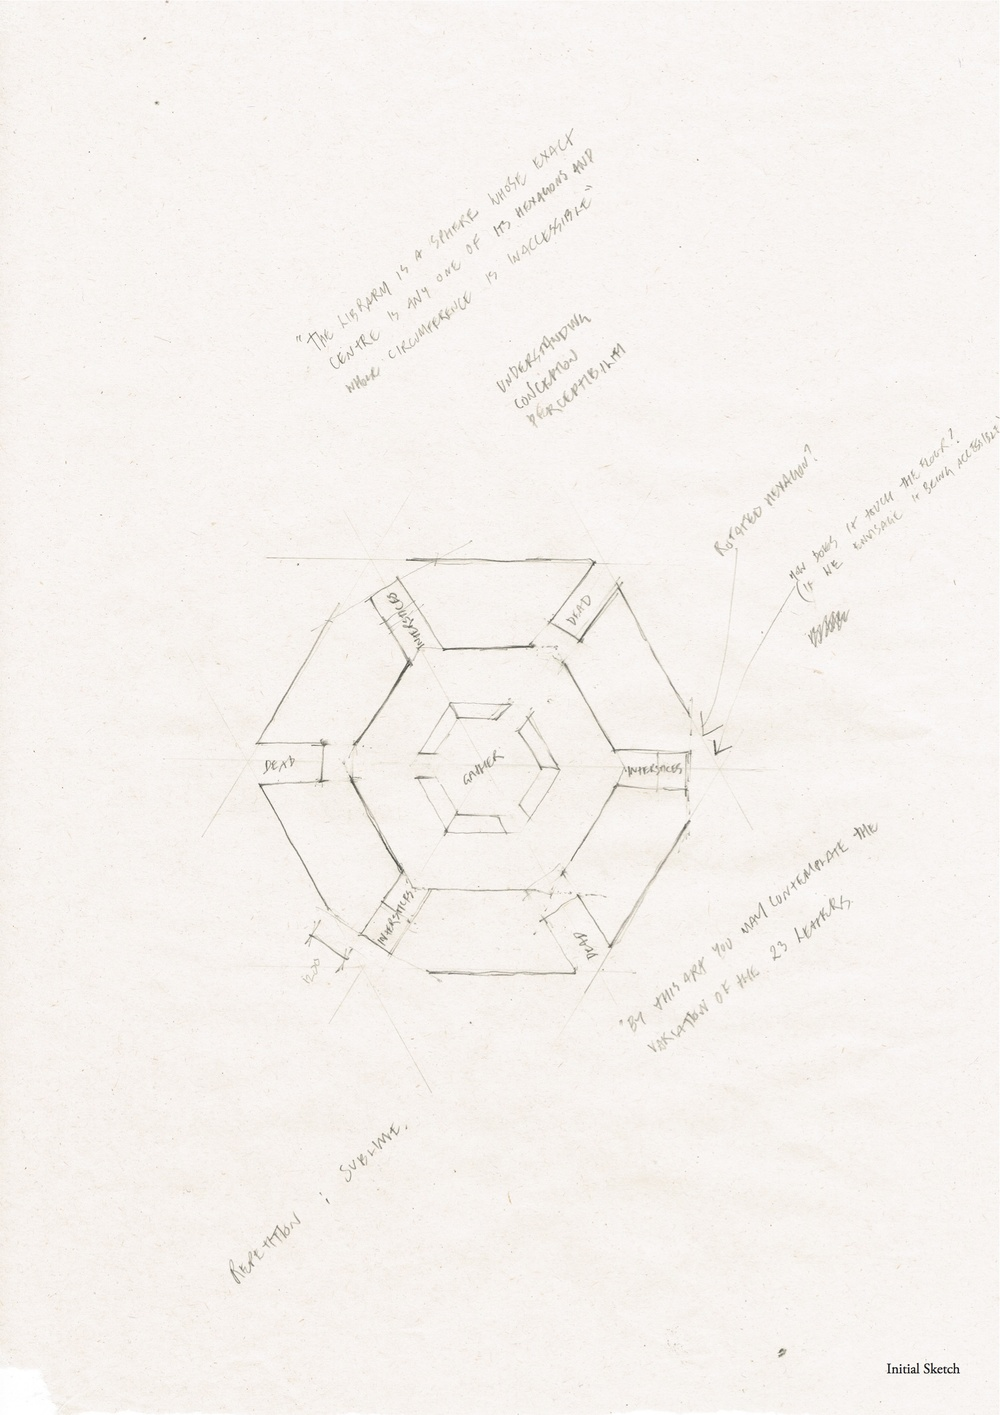 F & A initial sketch.jpg